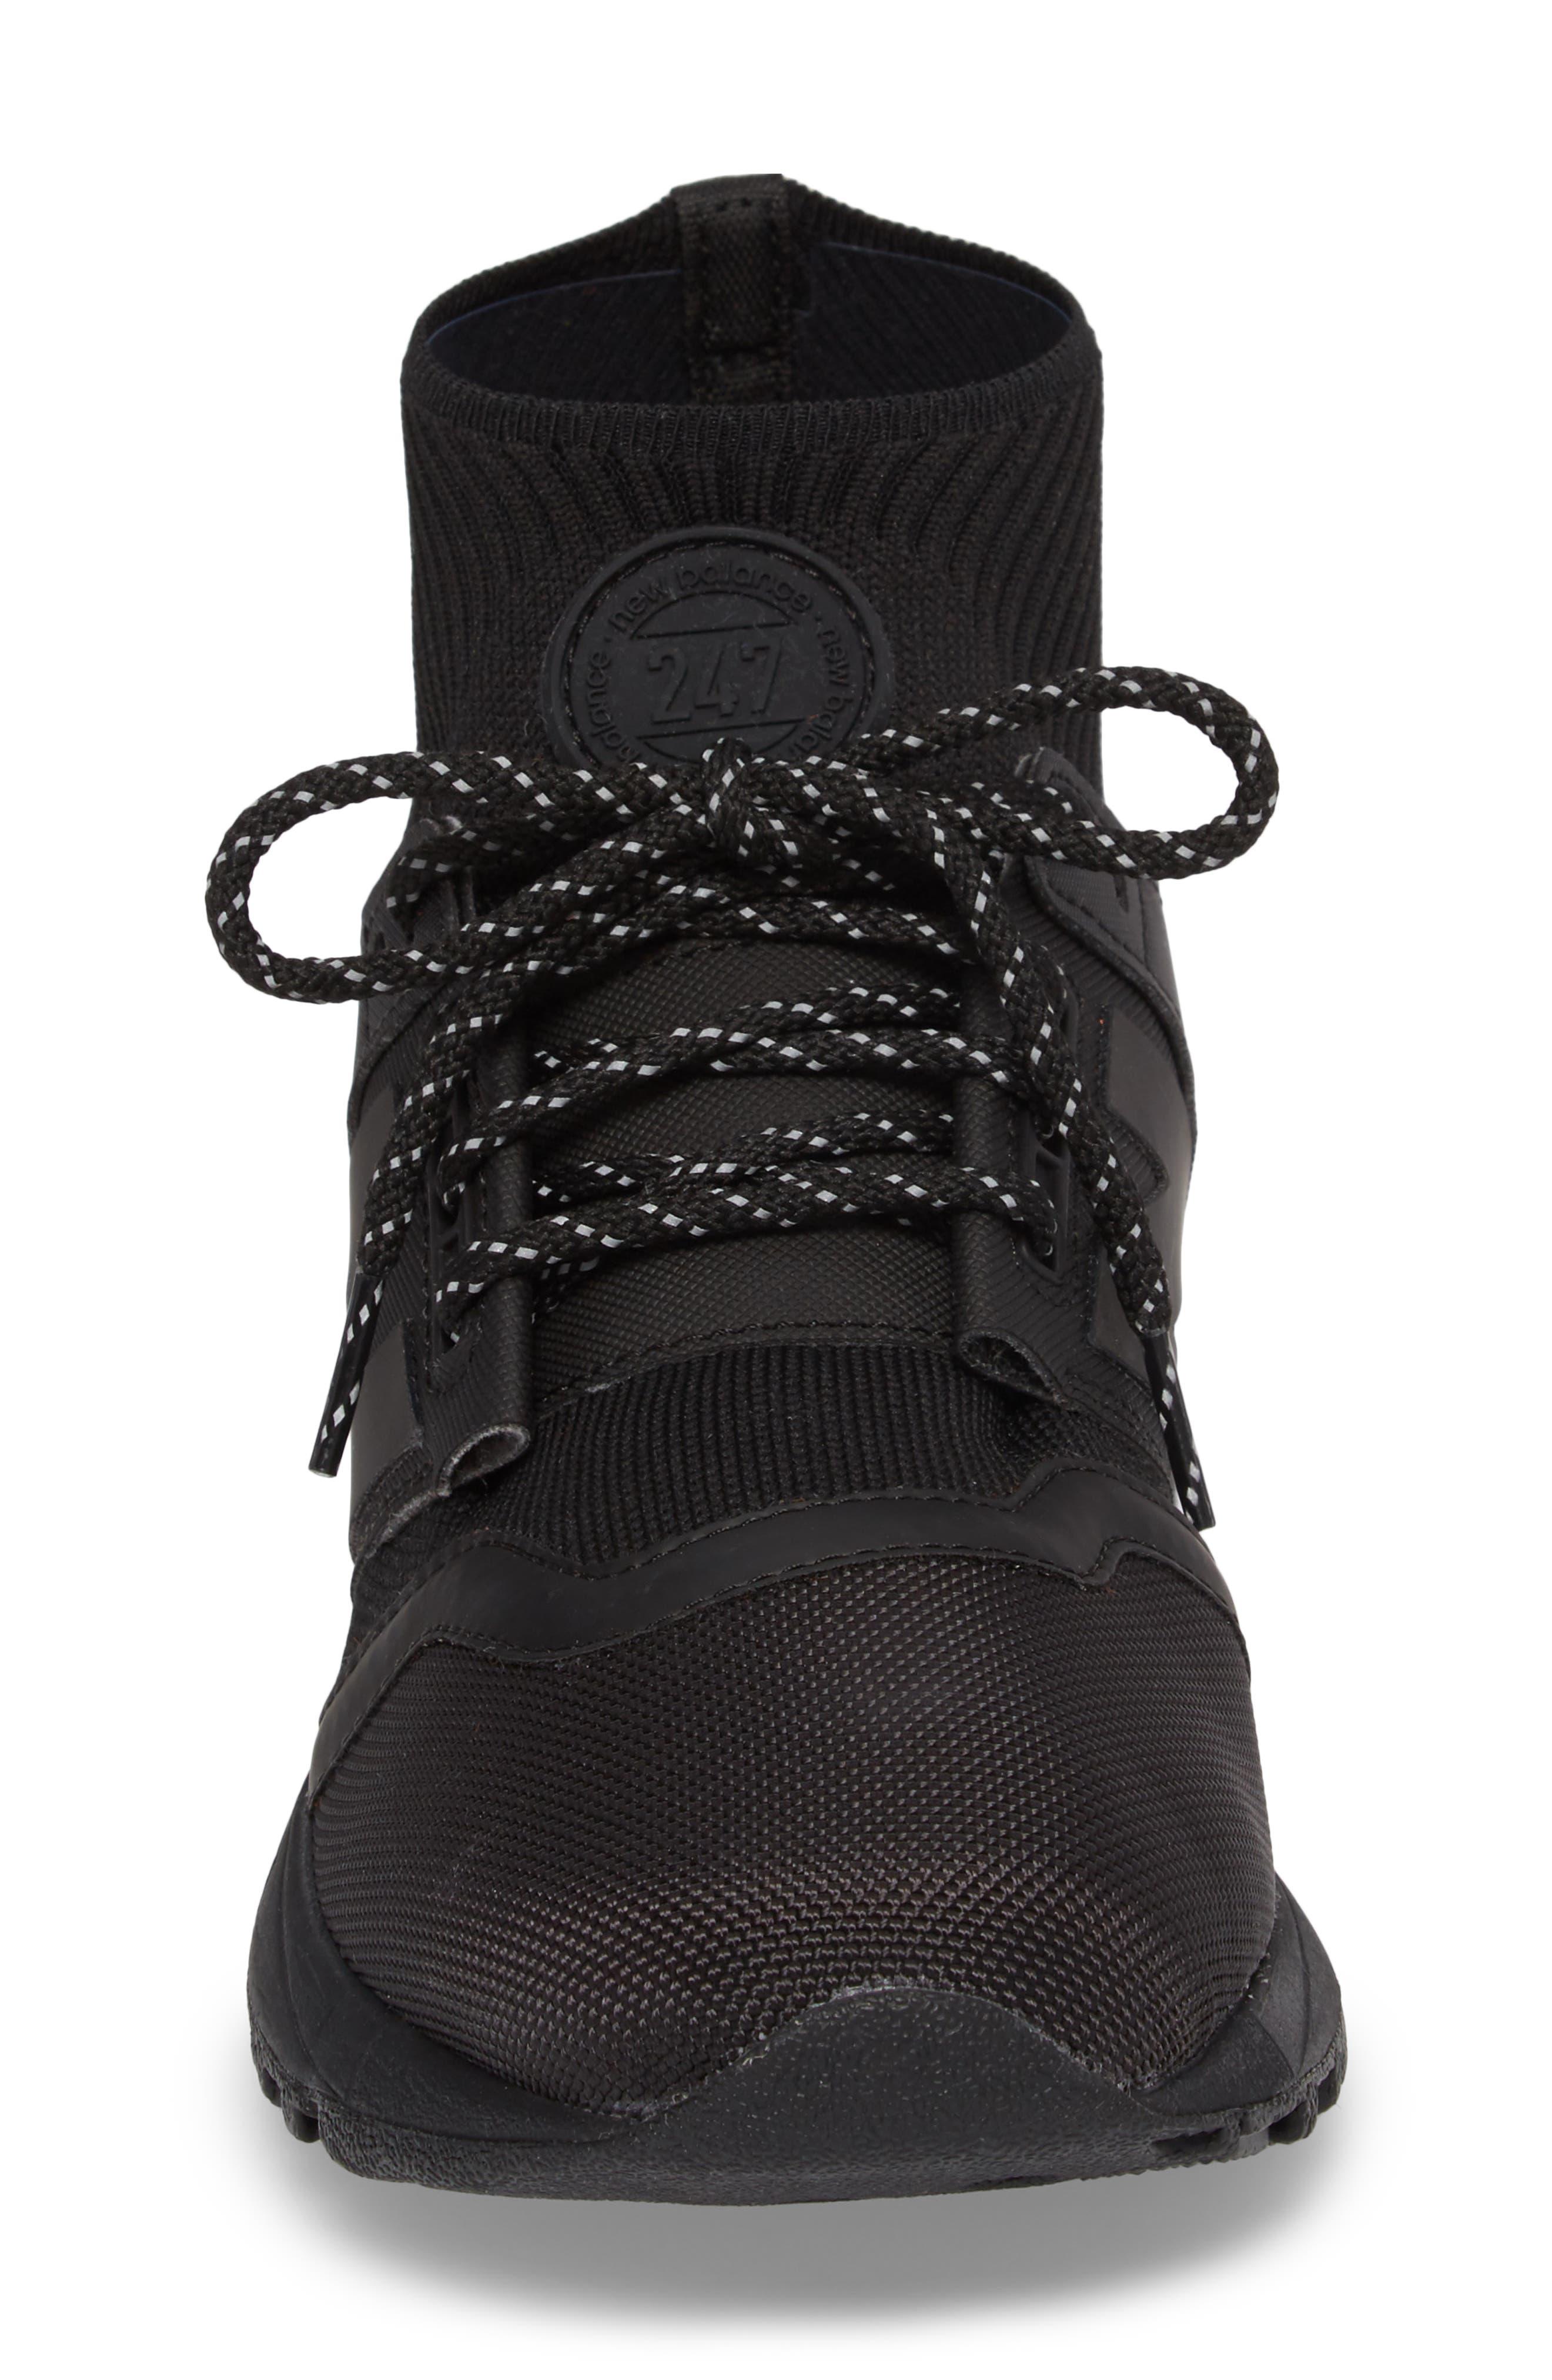 247 Mid Sneaker,                             Alternate thumbnail 13, color,